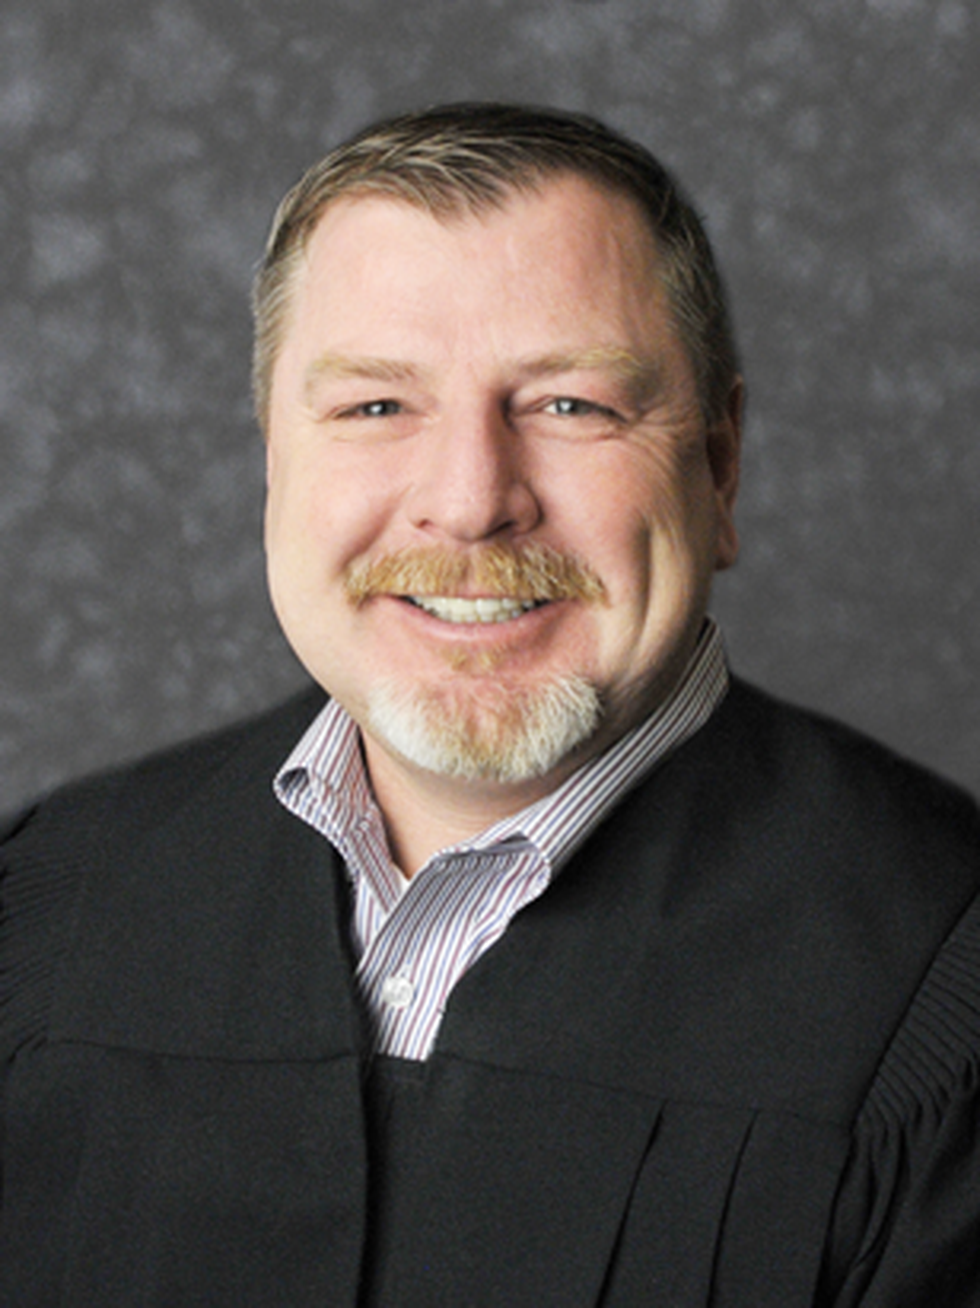 Judge Andrew Adams (Source: Indiana Supreme Court)